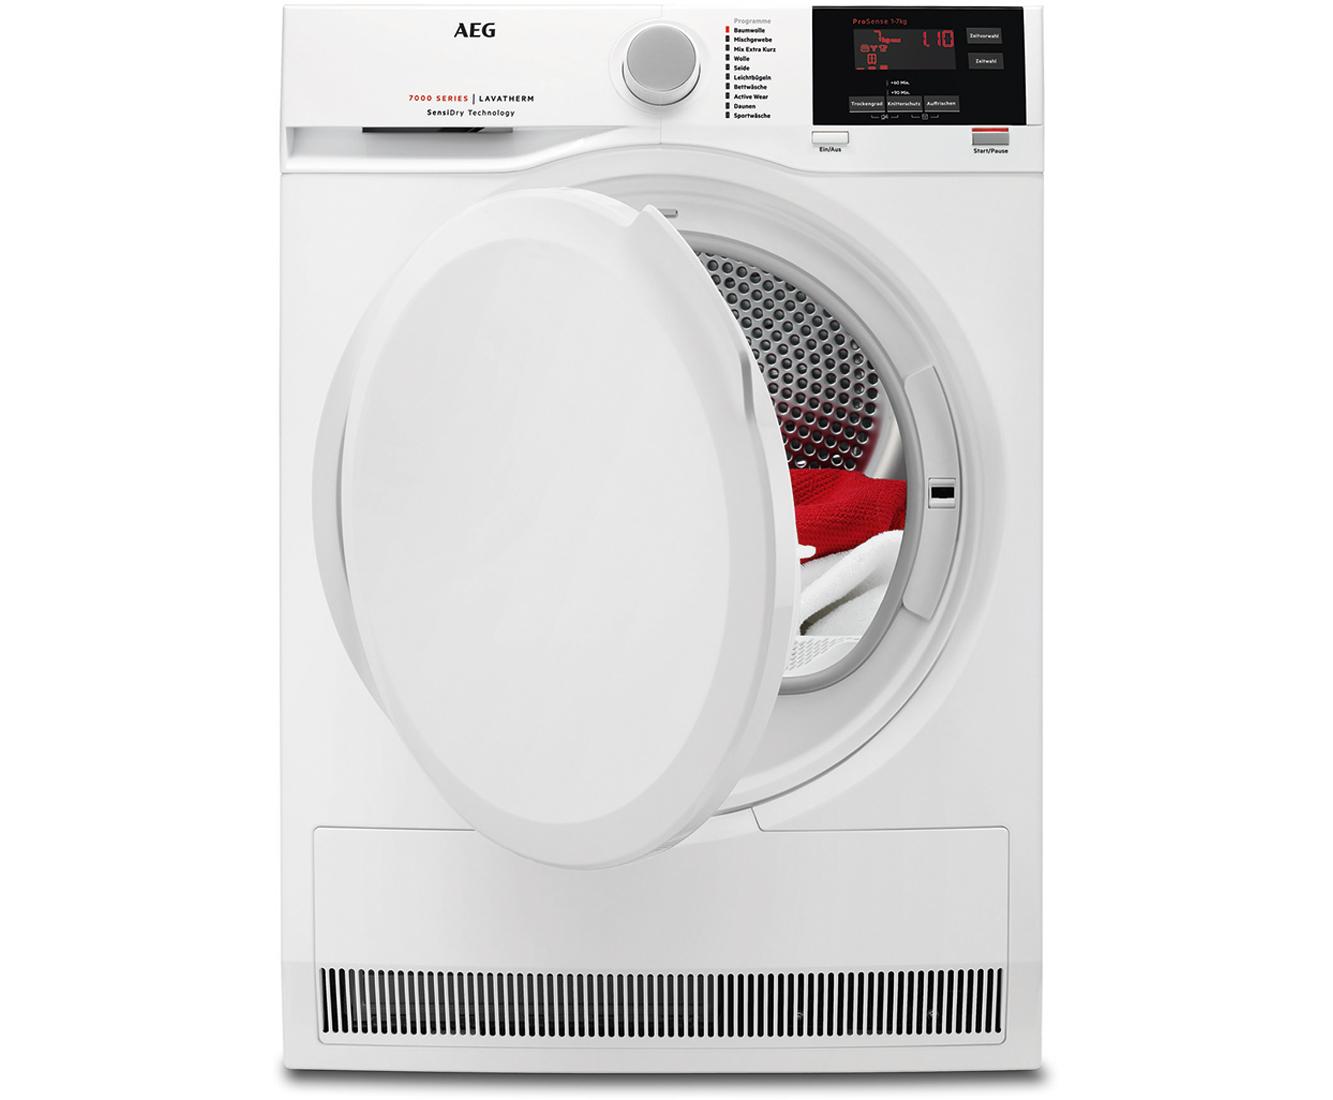 Aeg lavatherm t7db60470 wärmepumpentrockner 7 kg weiß a